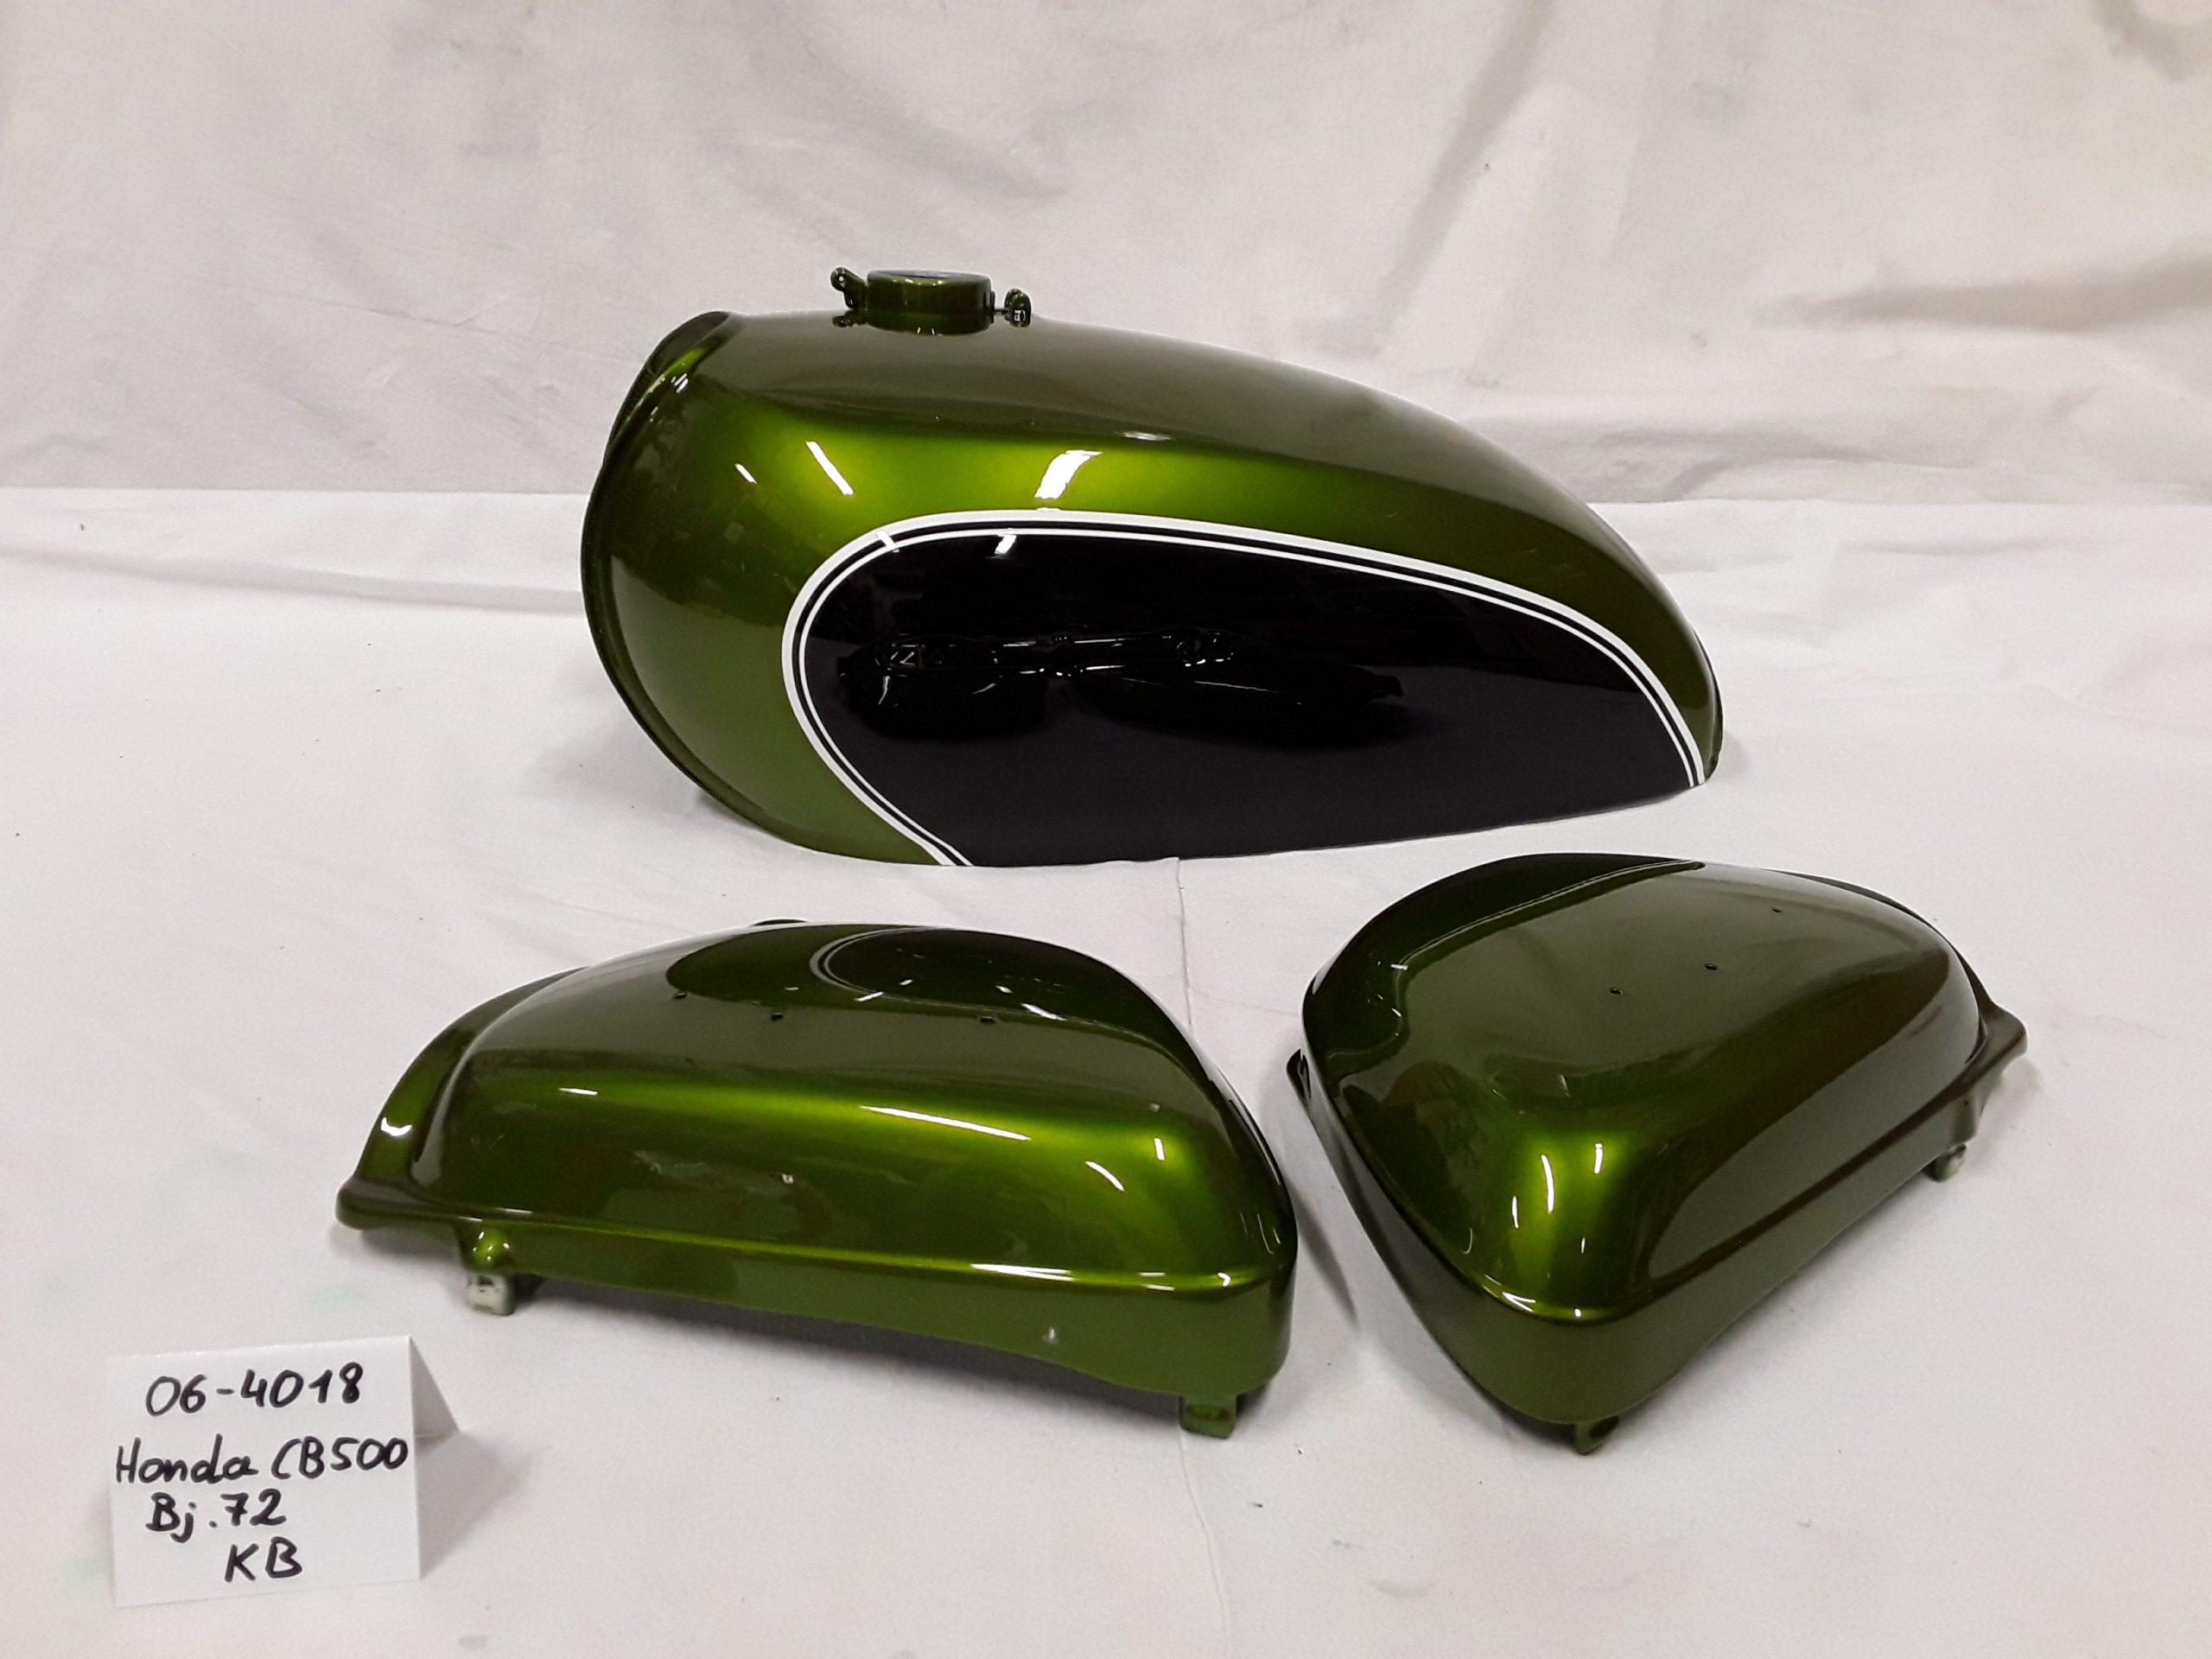 Honda CB500 Bj.1972 in KB candy jade green RH-Lacke Lackiererei Motorradlackierung